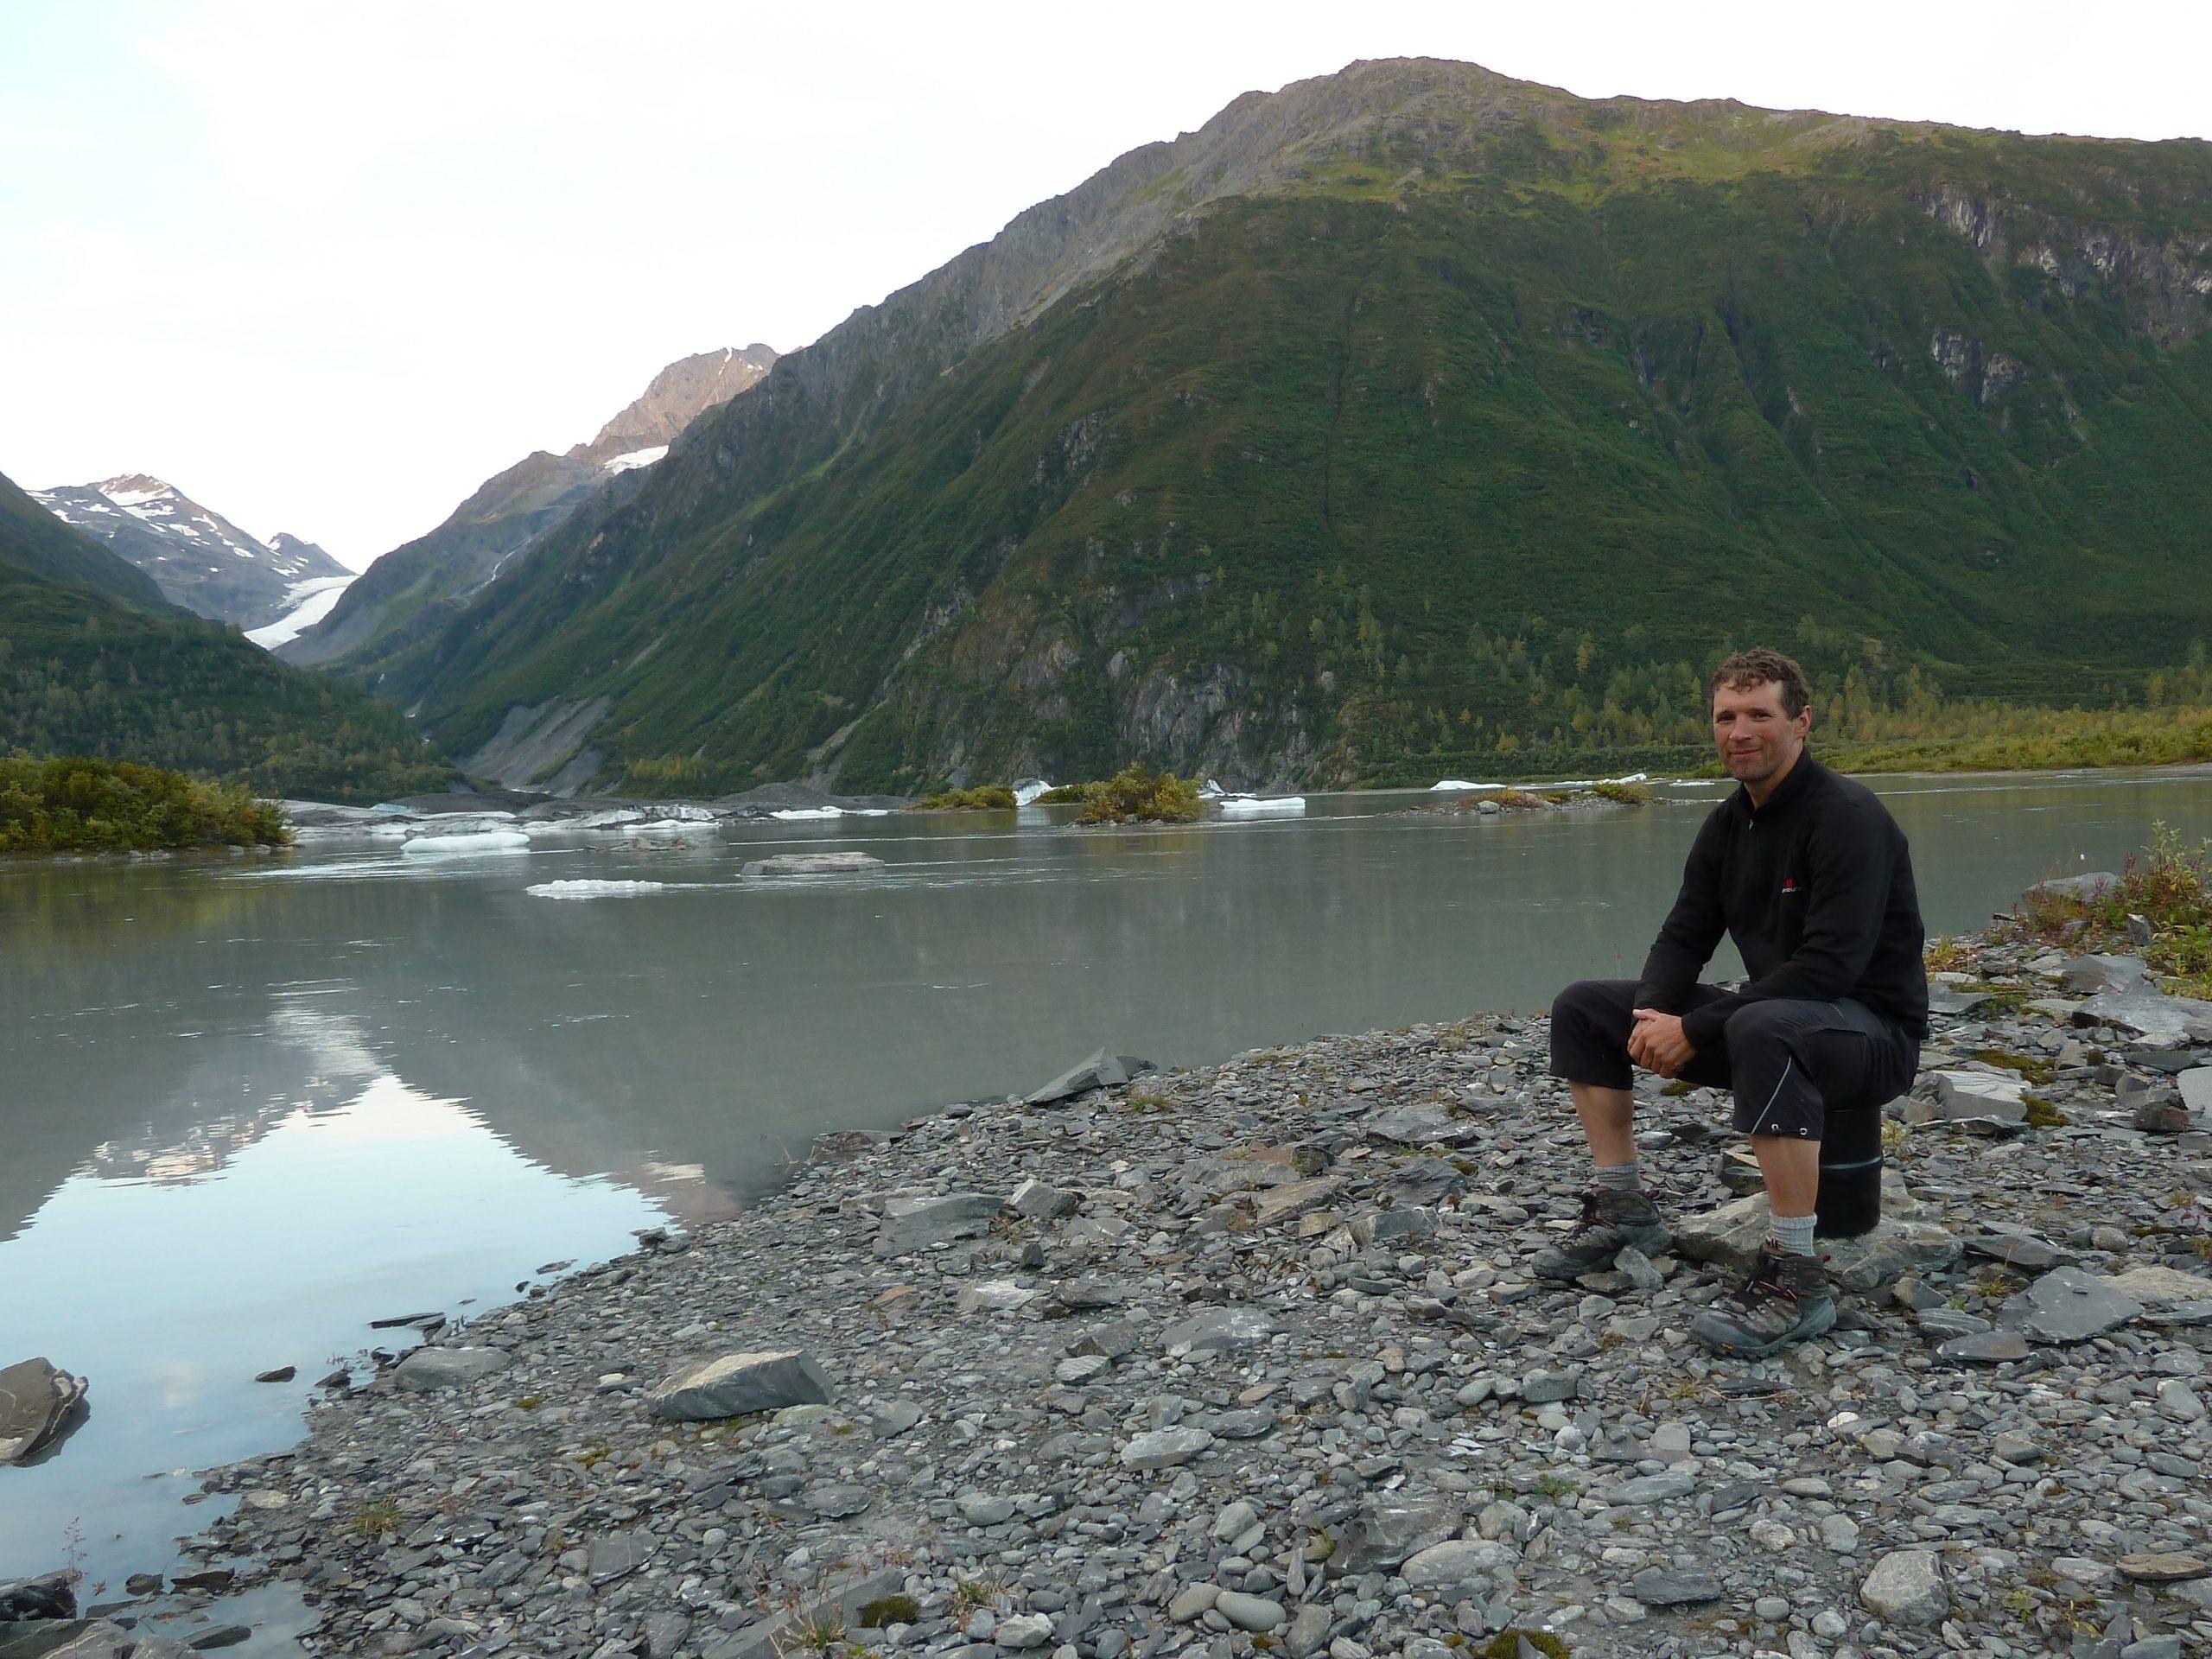 Radreise Alaska 2010 - Zeltplatz am Valdez Glacier